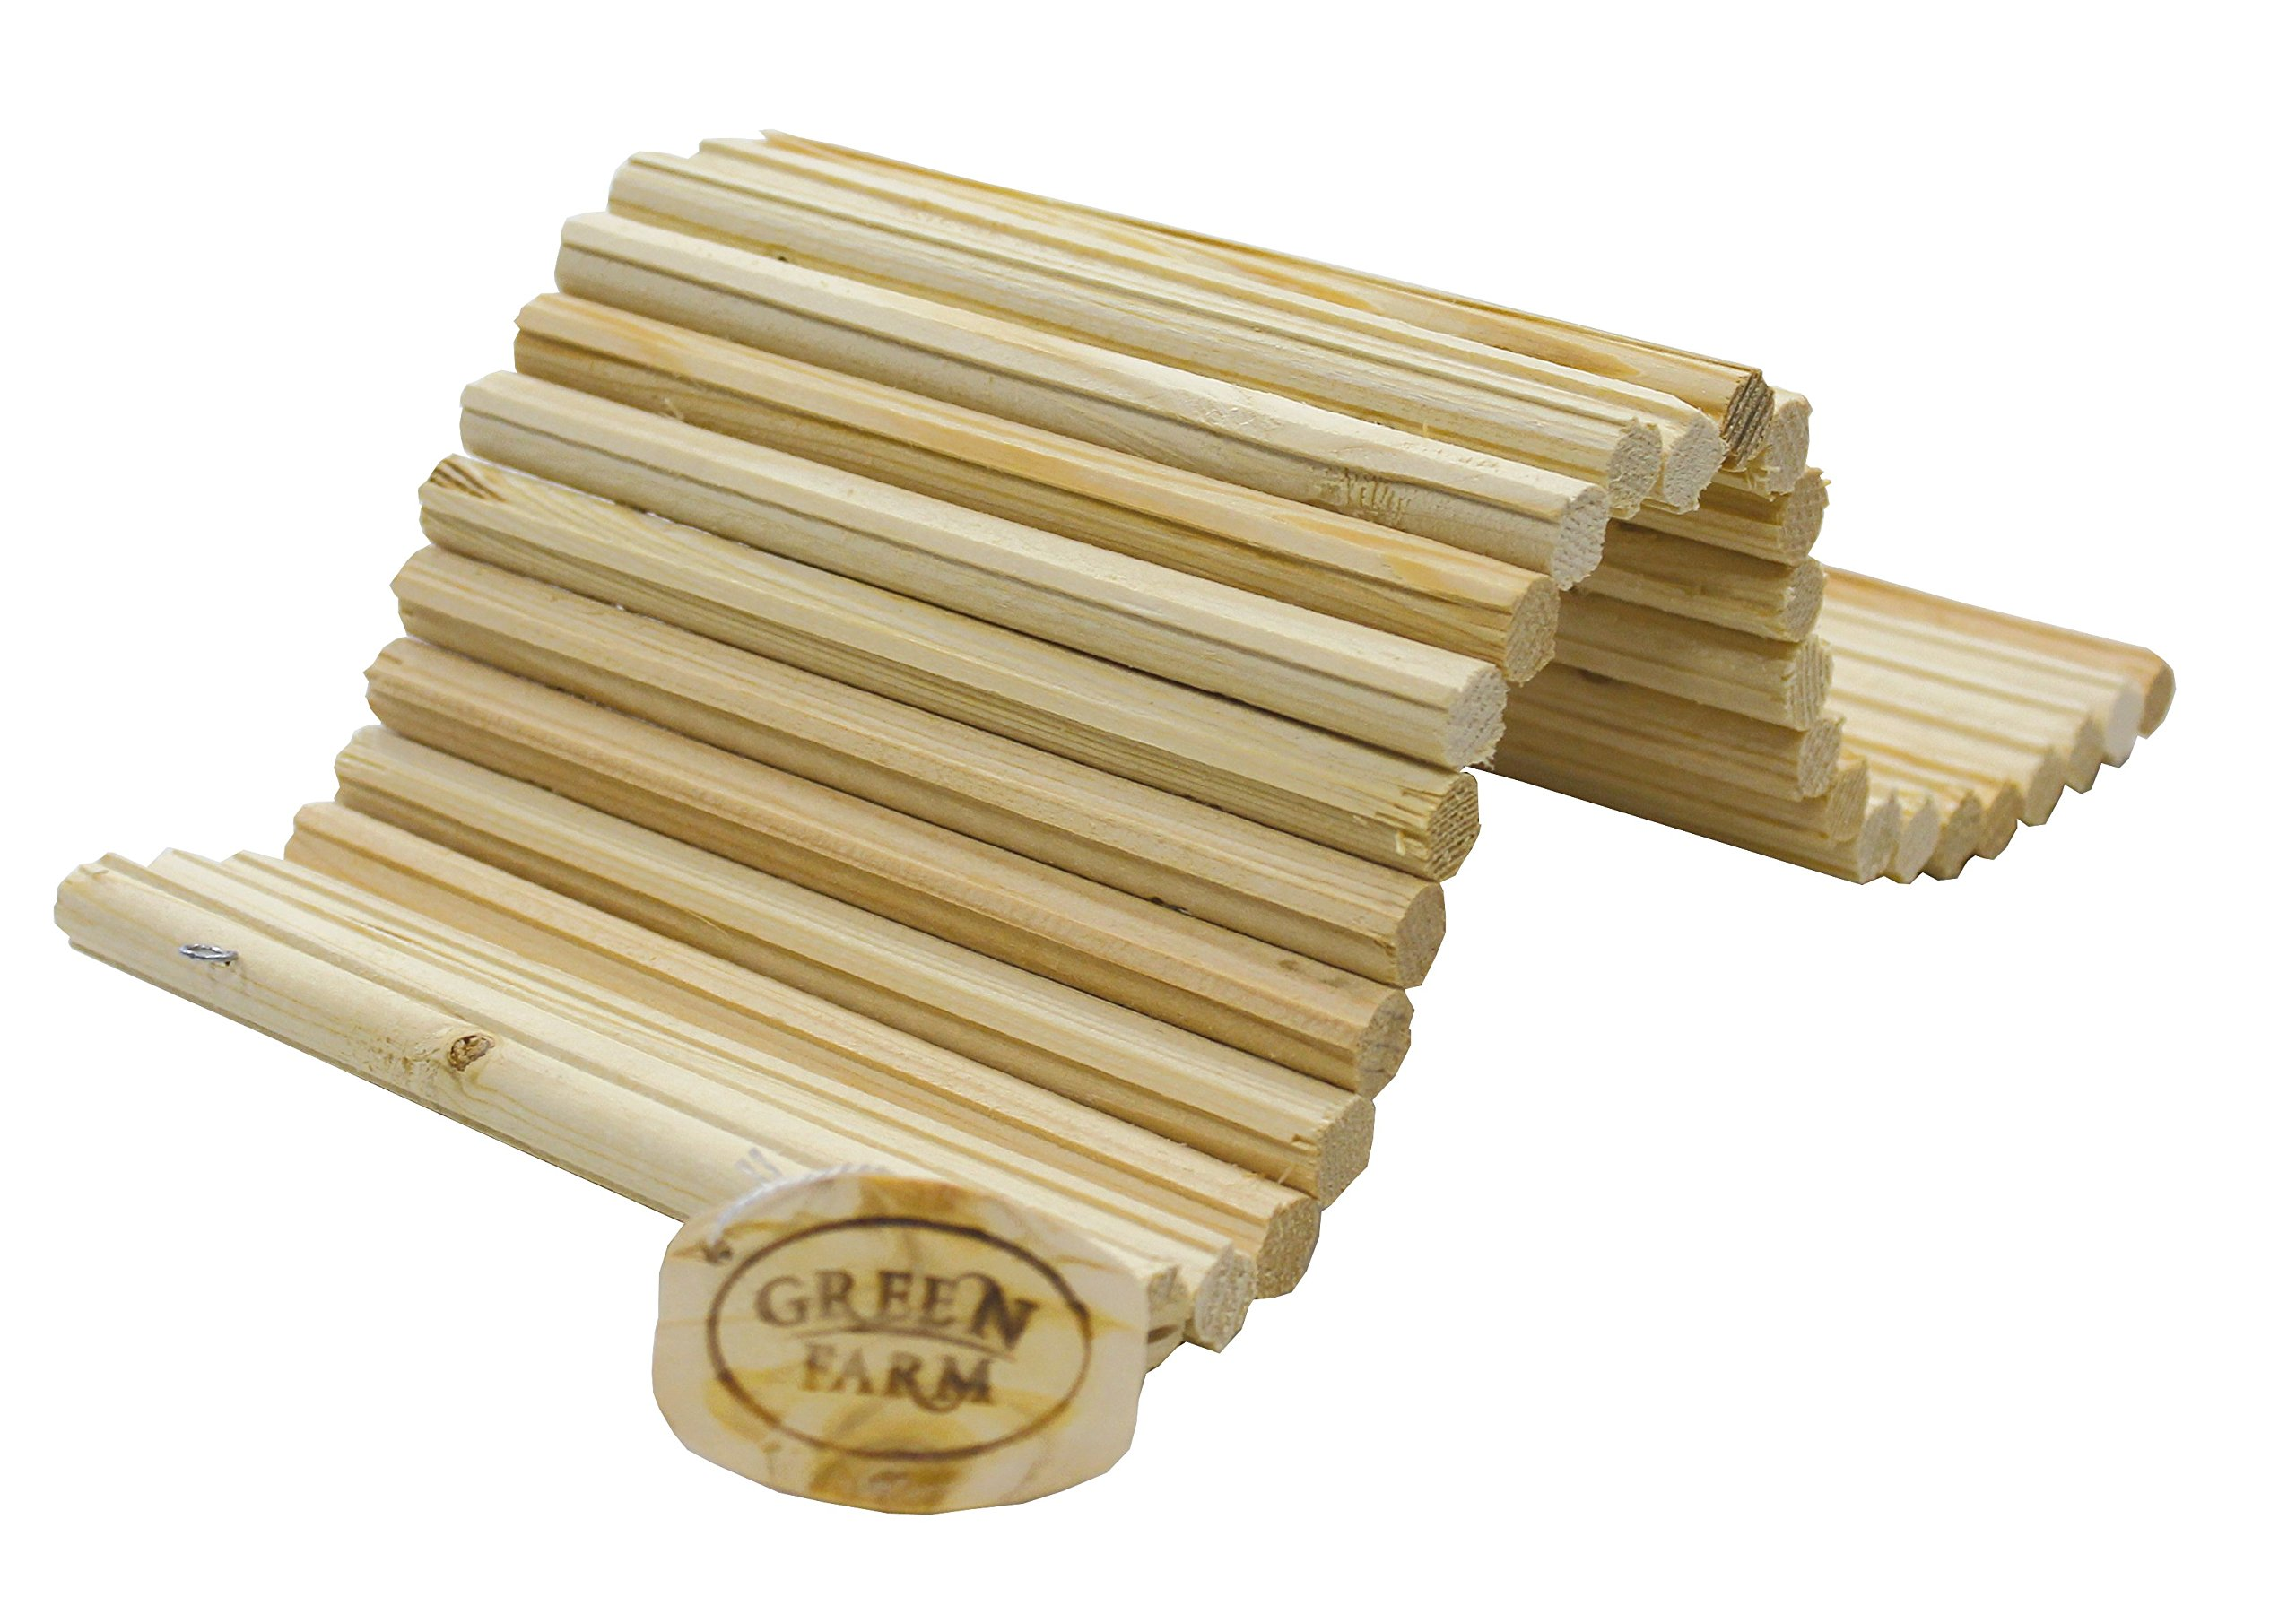 Pine Wood Sticks Flexible Hideout Ladder Toy Medium 14'' Long